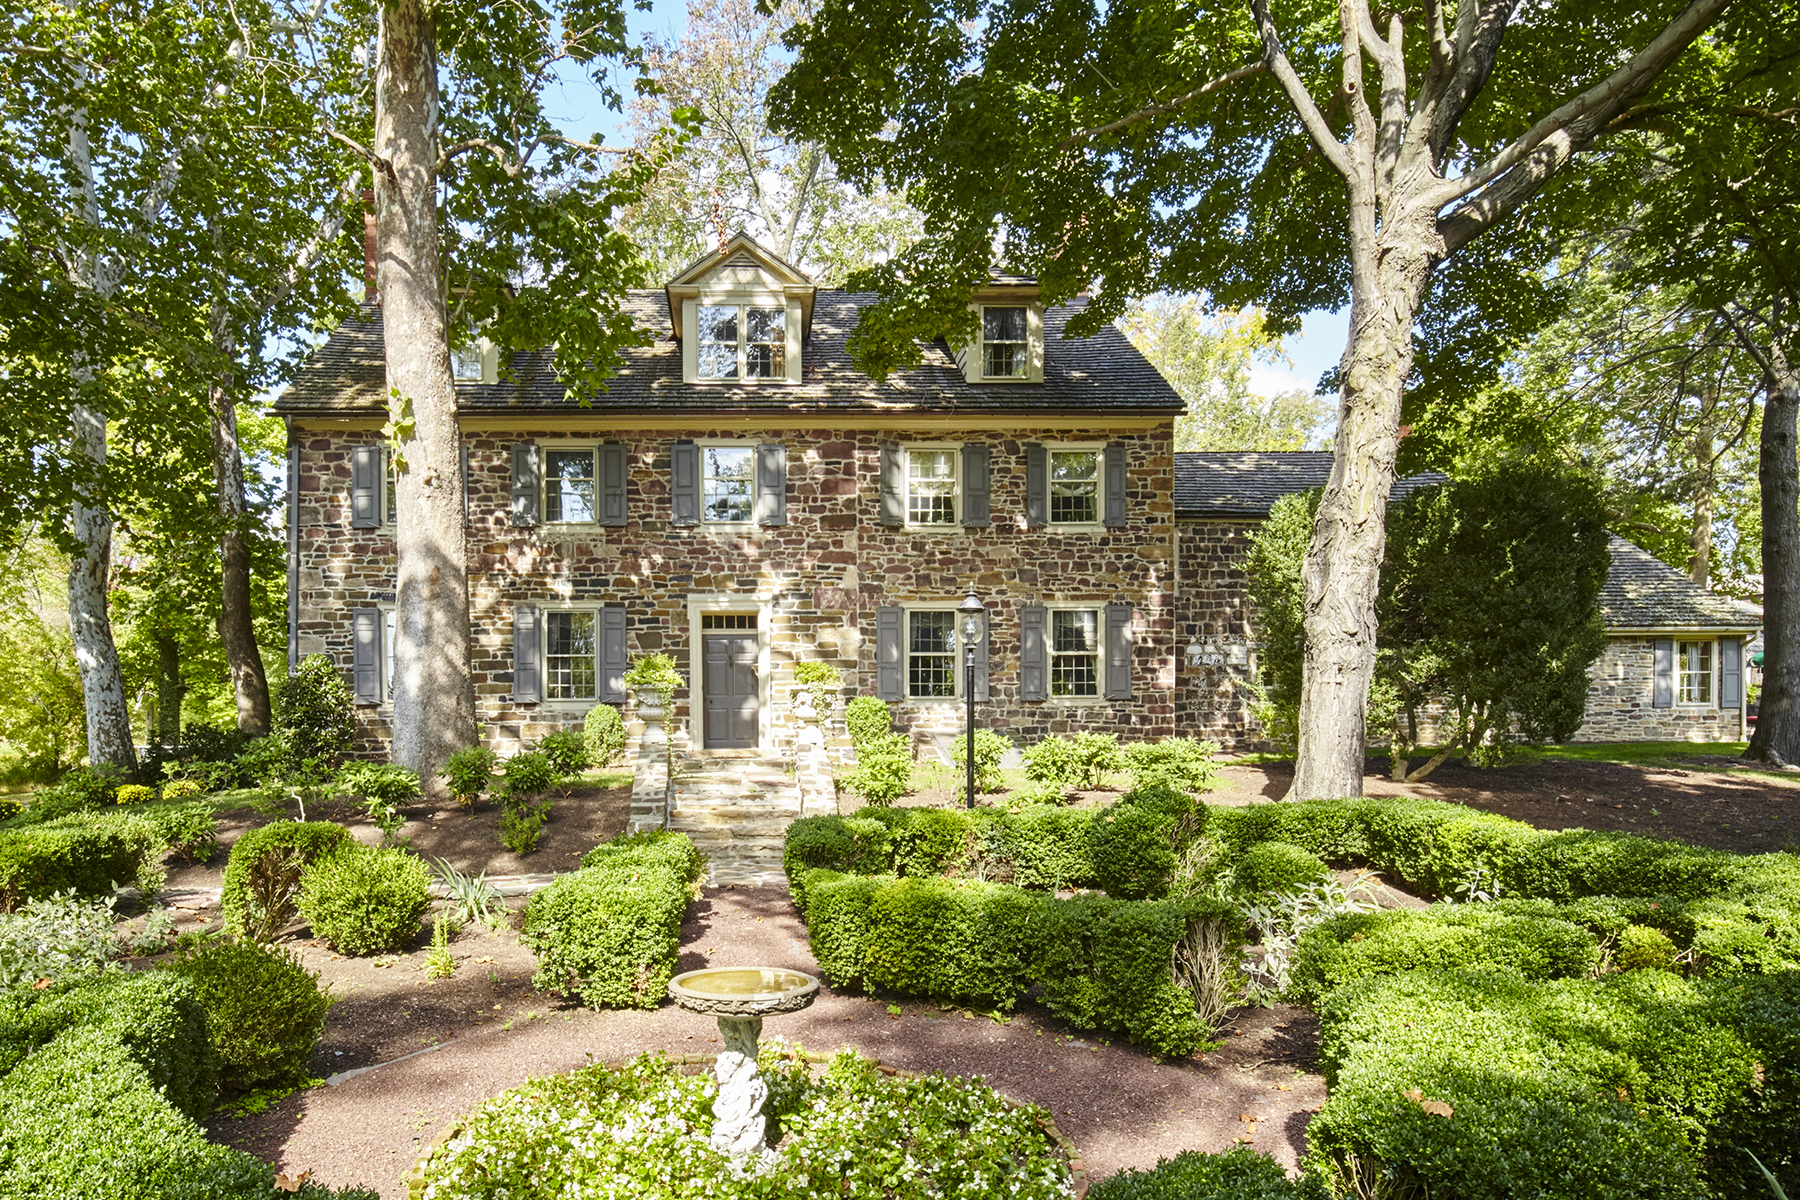 Single Family Home for Sale at Historic Glendower Farm 1221 Meetinghouse Road Gwynedd, Pennsylvania 19436 United States